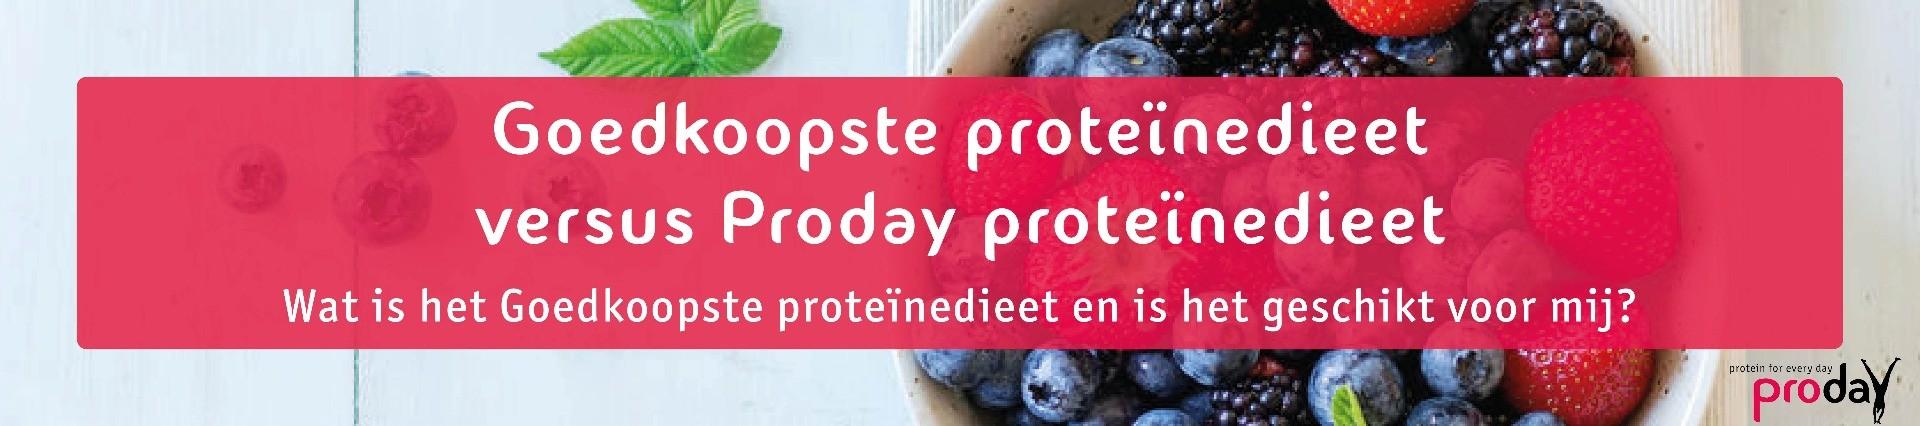 goedkoopste proteinedieet alternatief